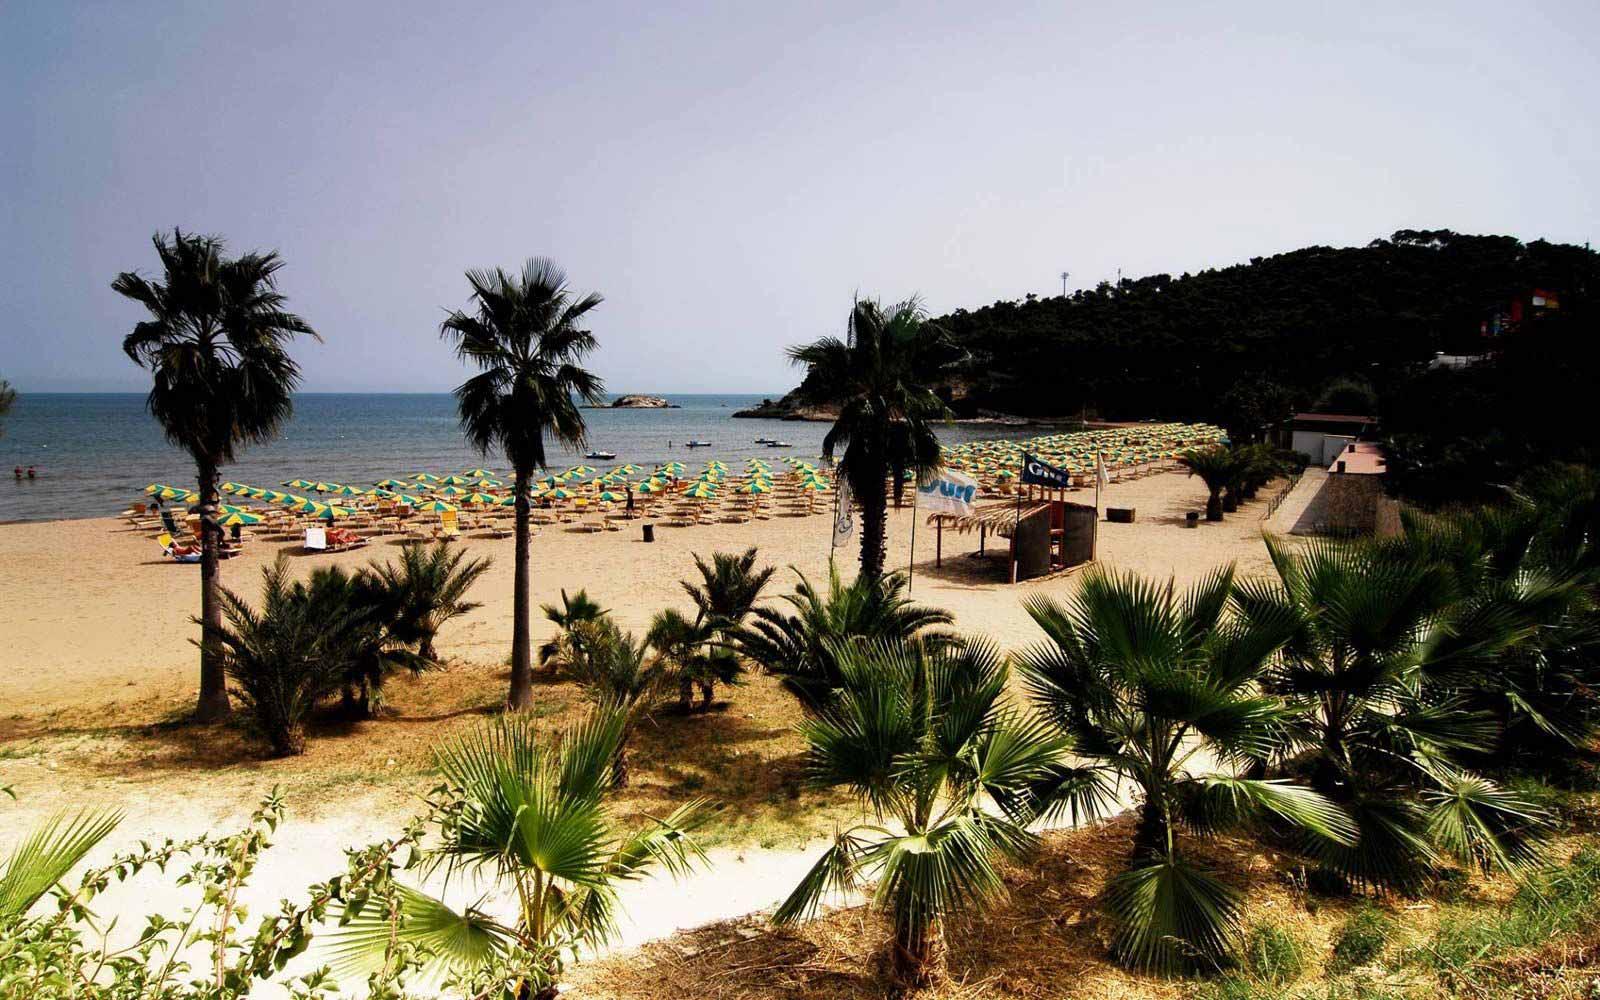 Beach at the Gattarella Resort